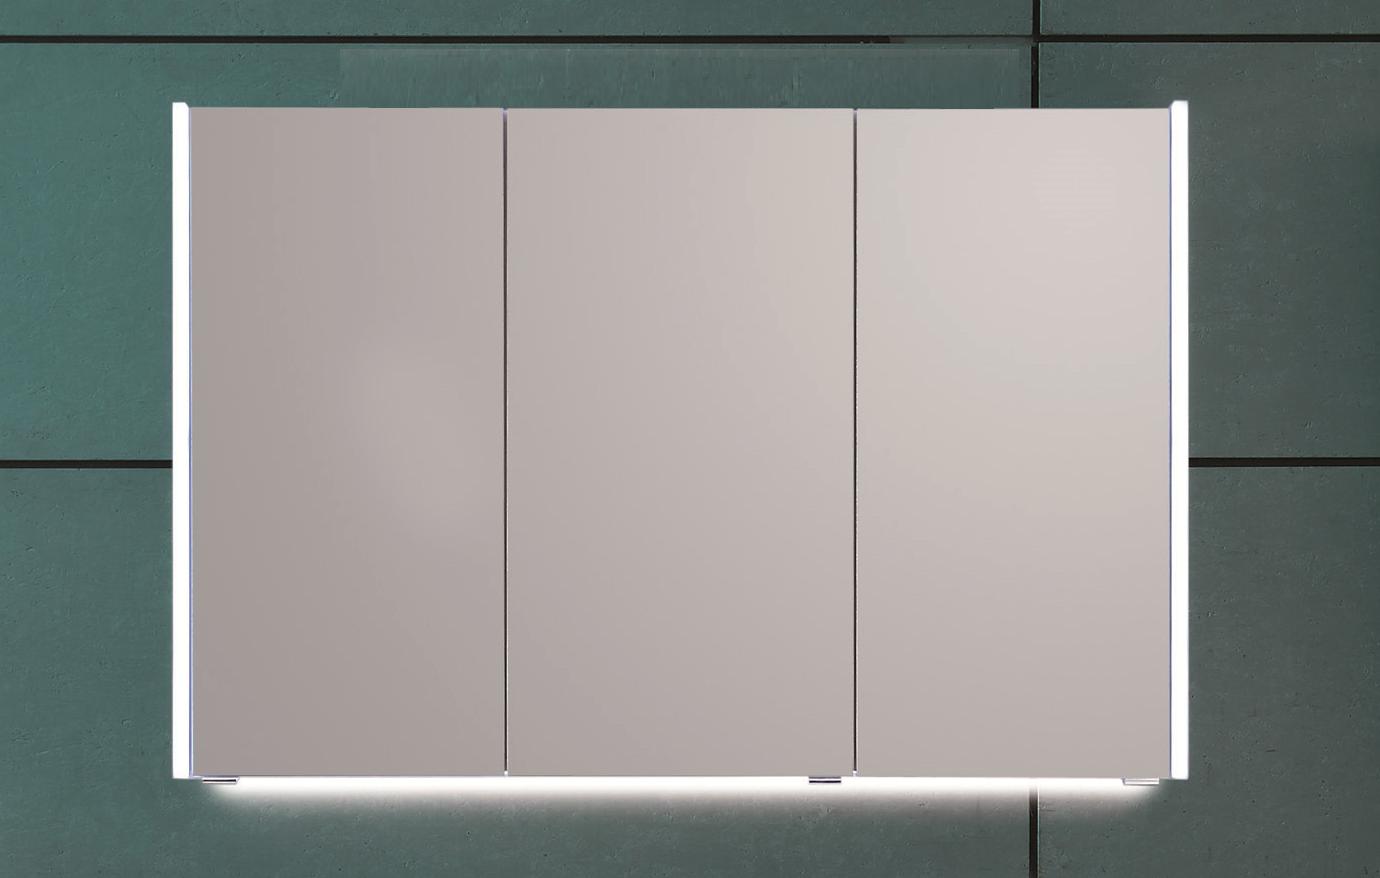 puris quada spiegelschrank 120 cm breit s2a531203 badm bel 1. Black Bedroom Furniture Sets. Home Design Ideas